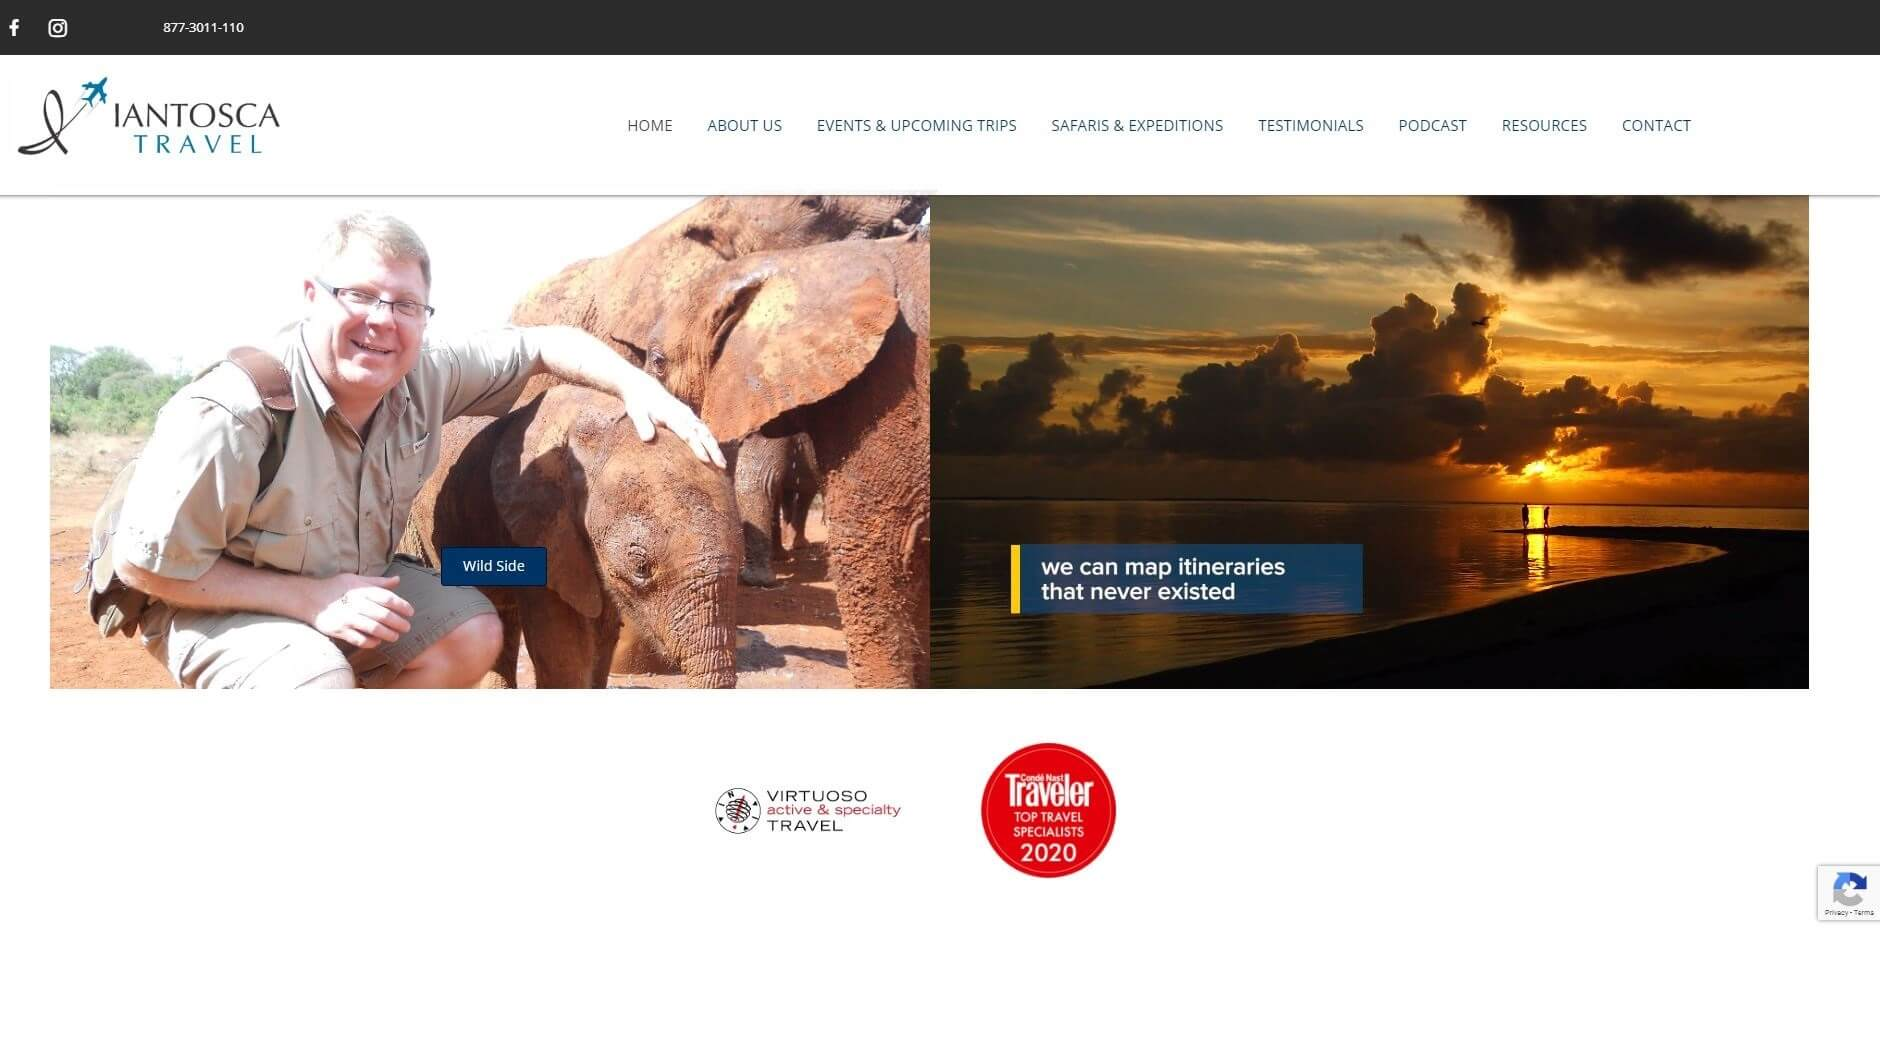 Iantoscatravel homepage